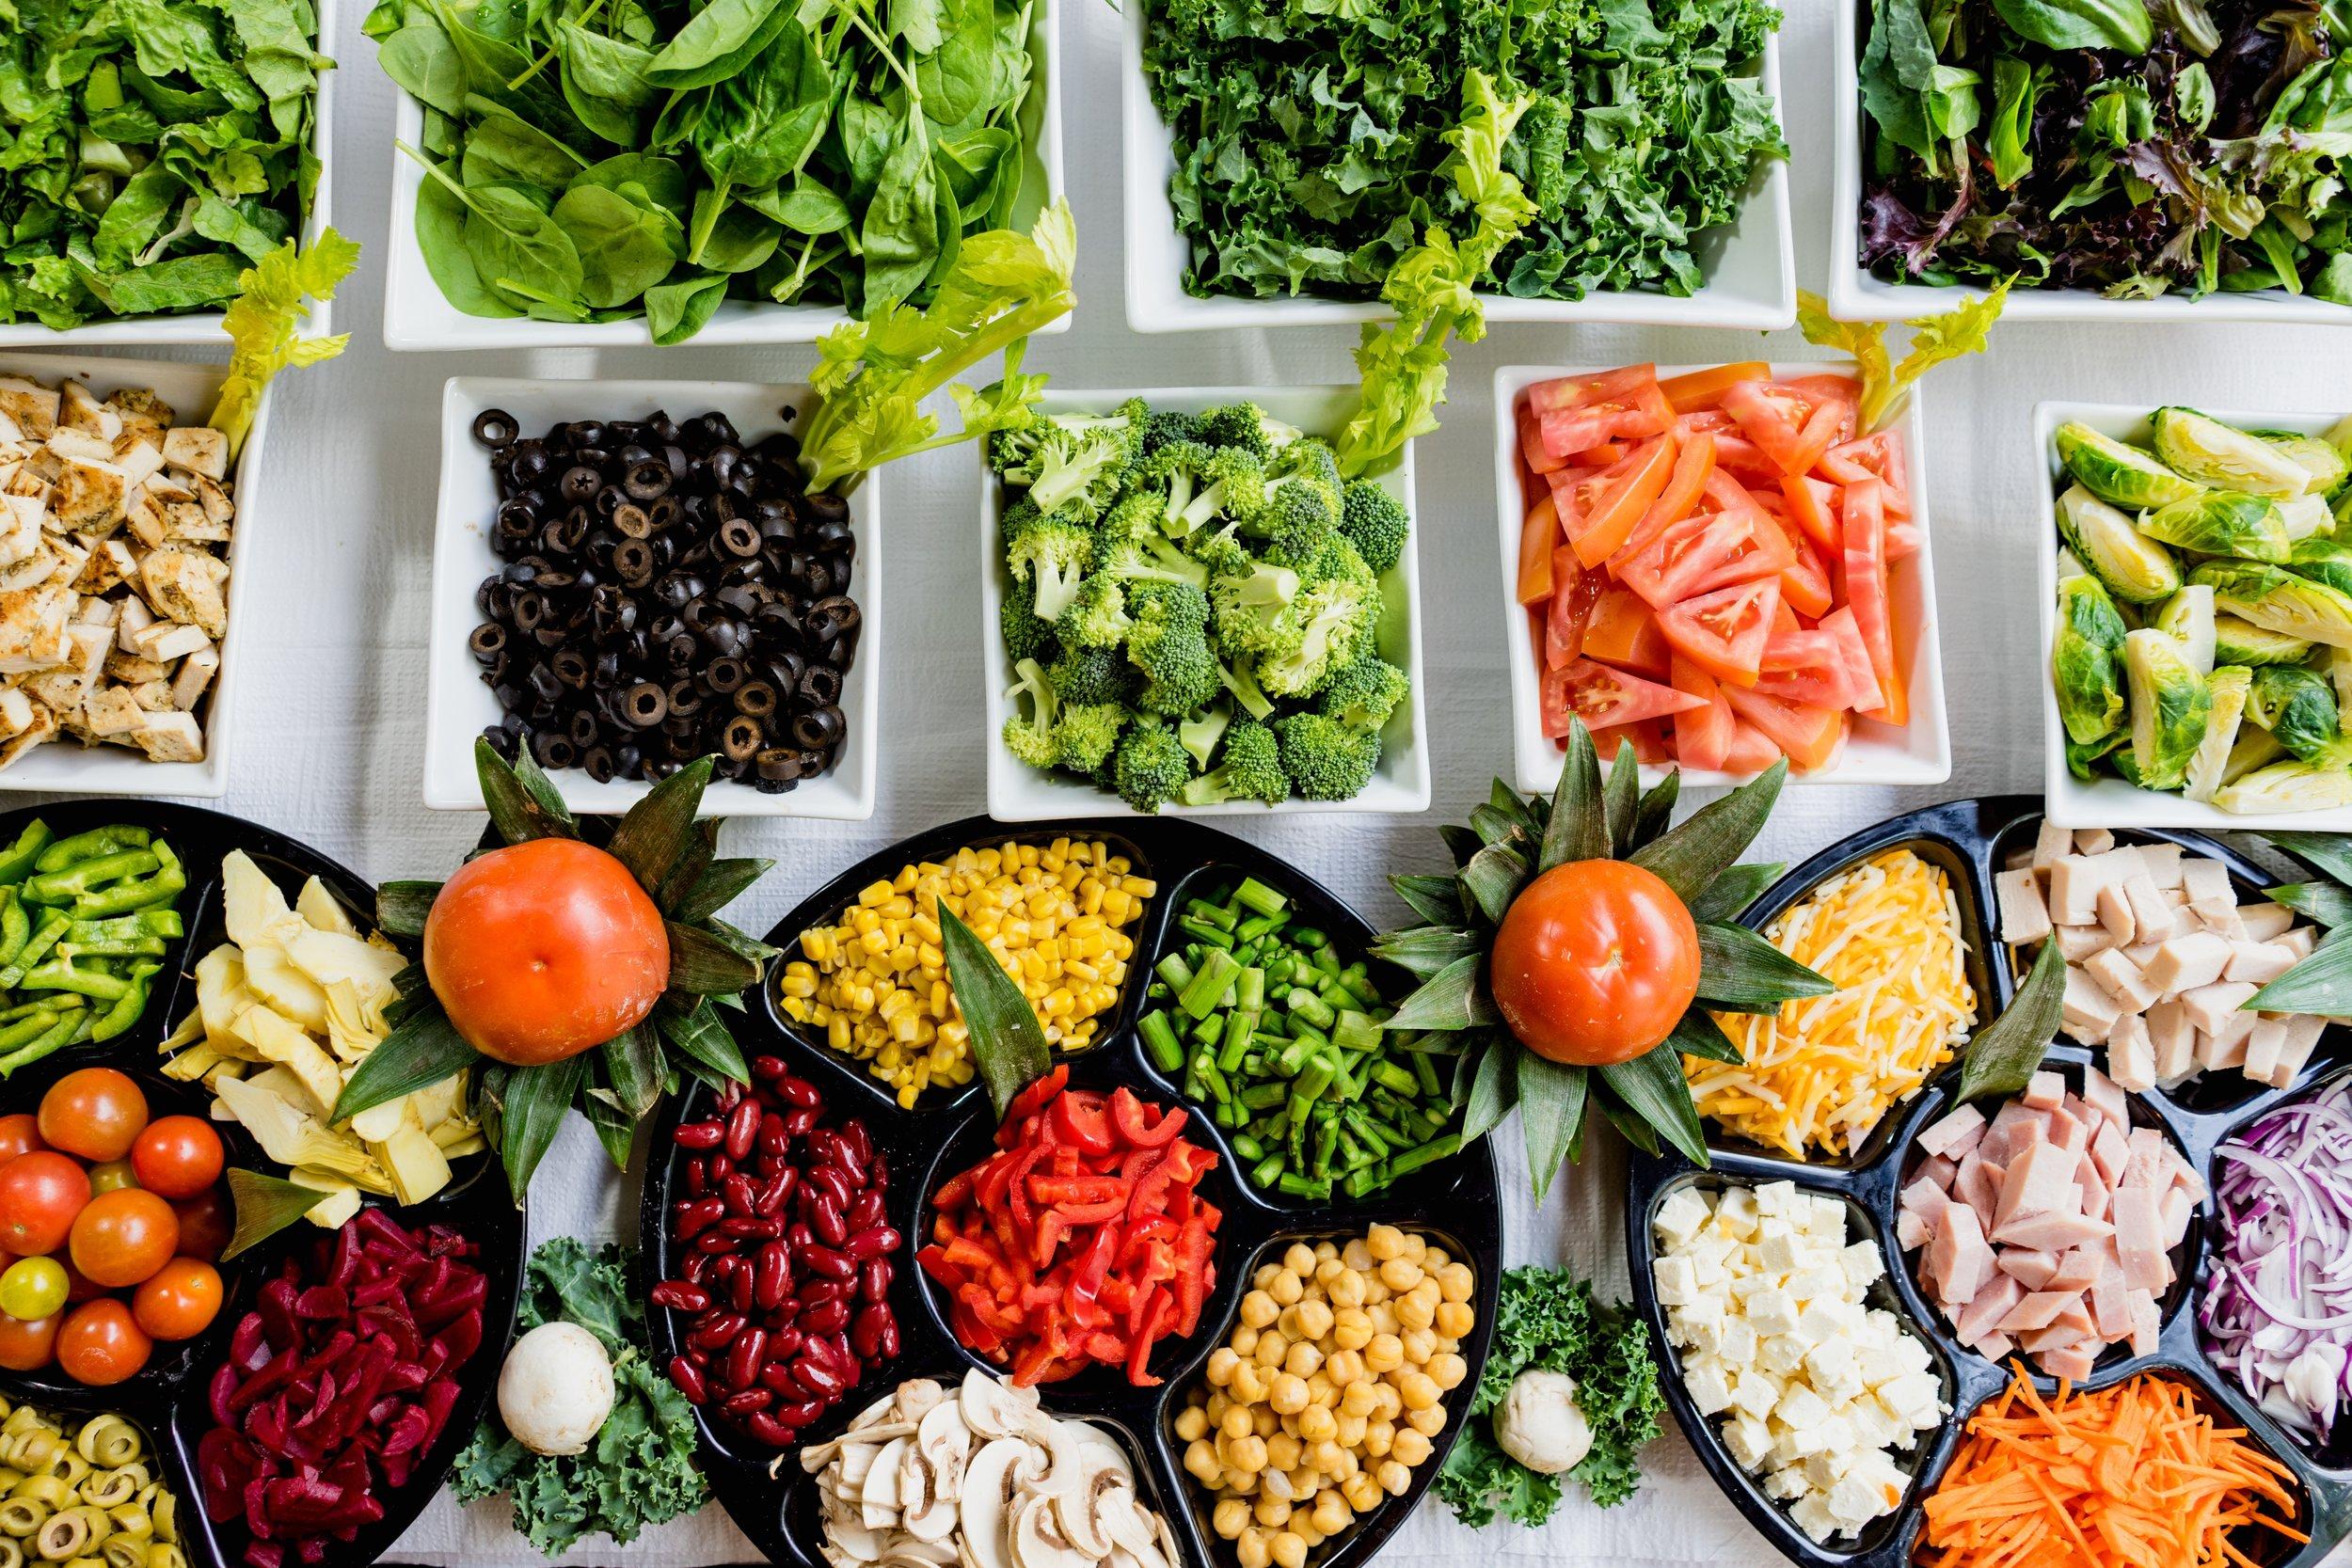 chp-healthy-food.jpg